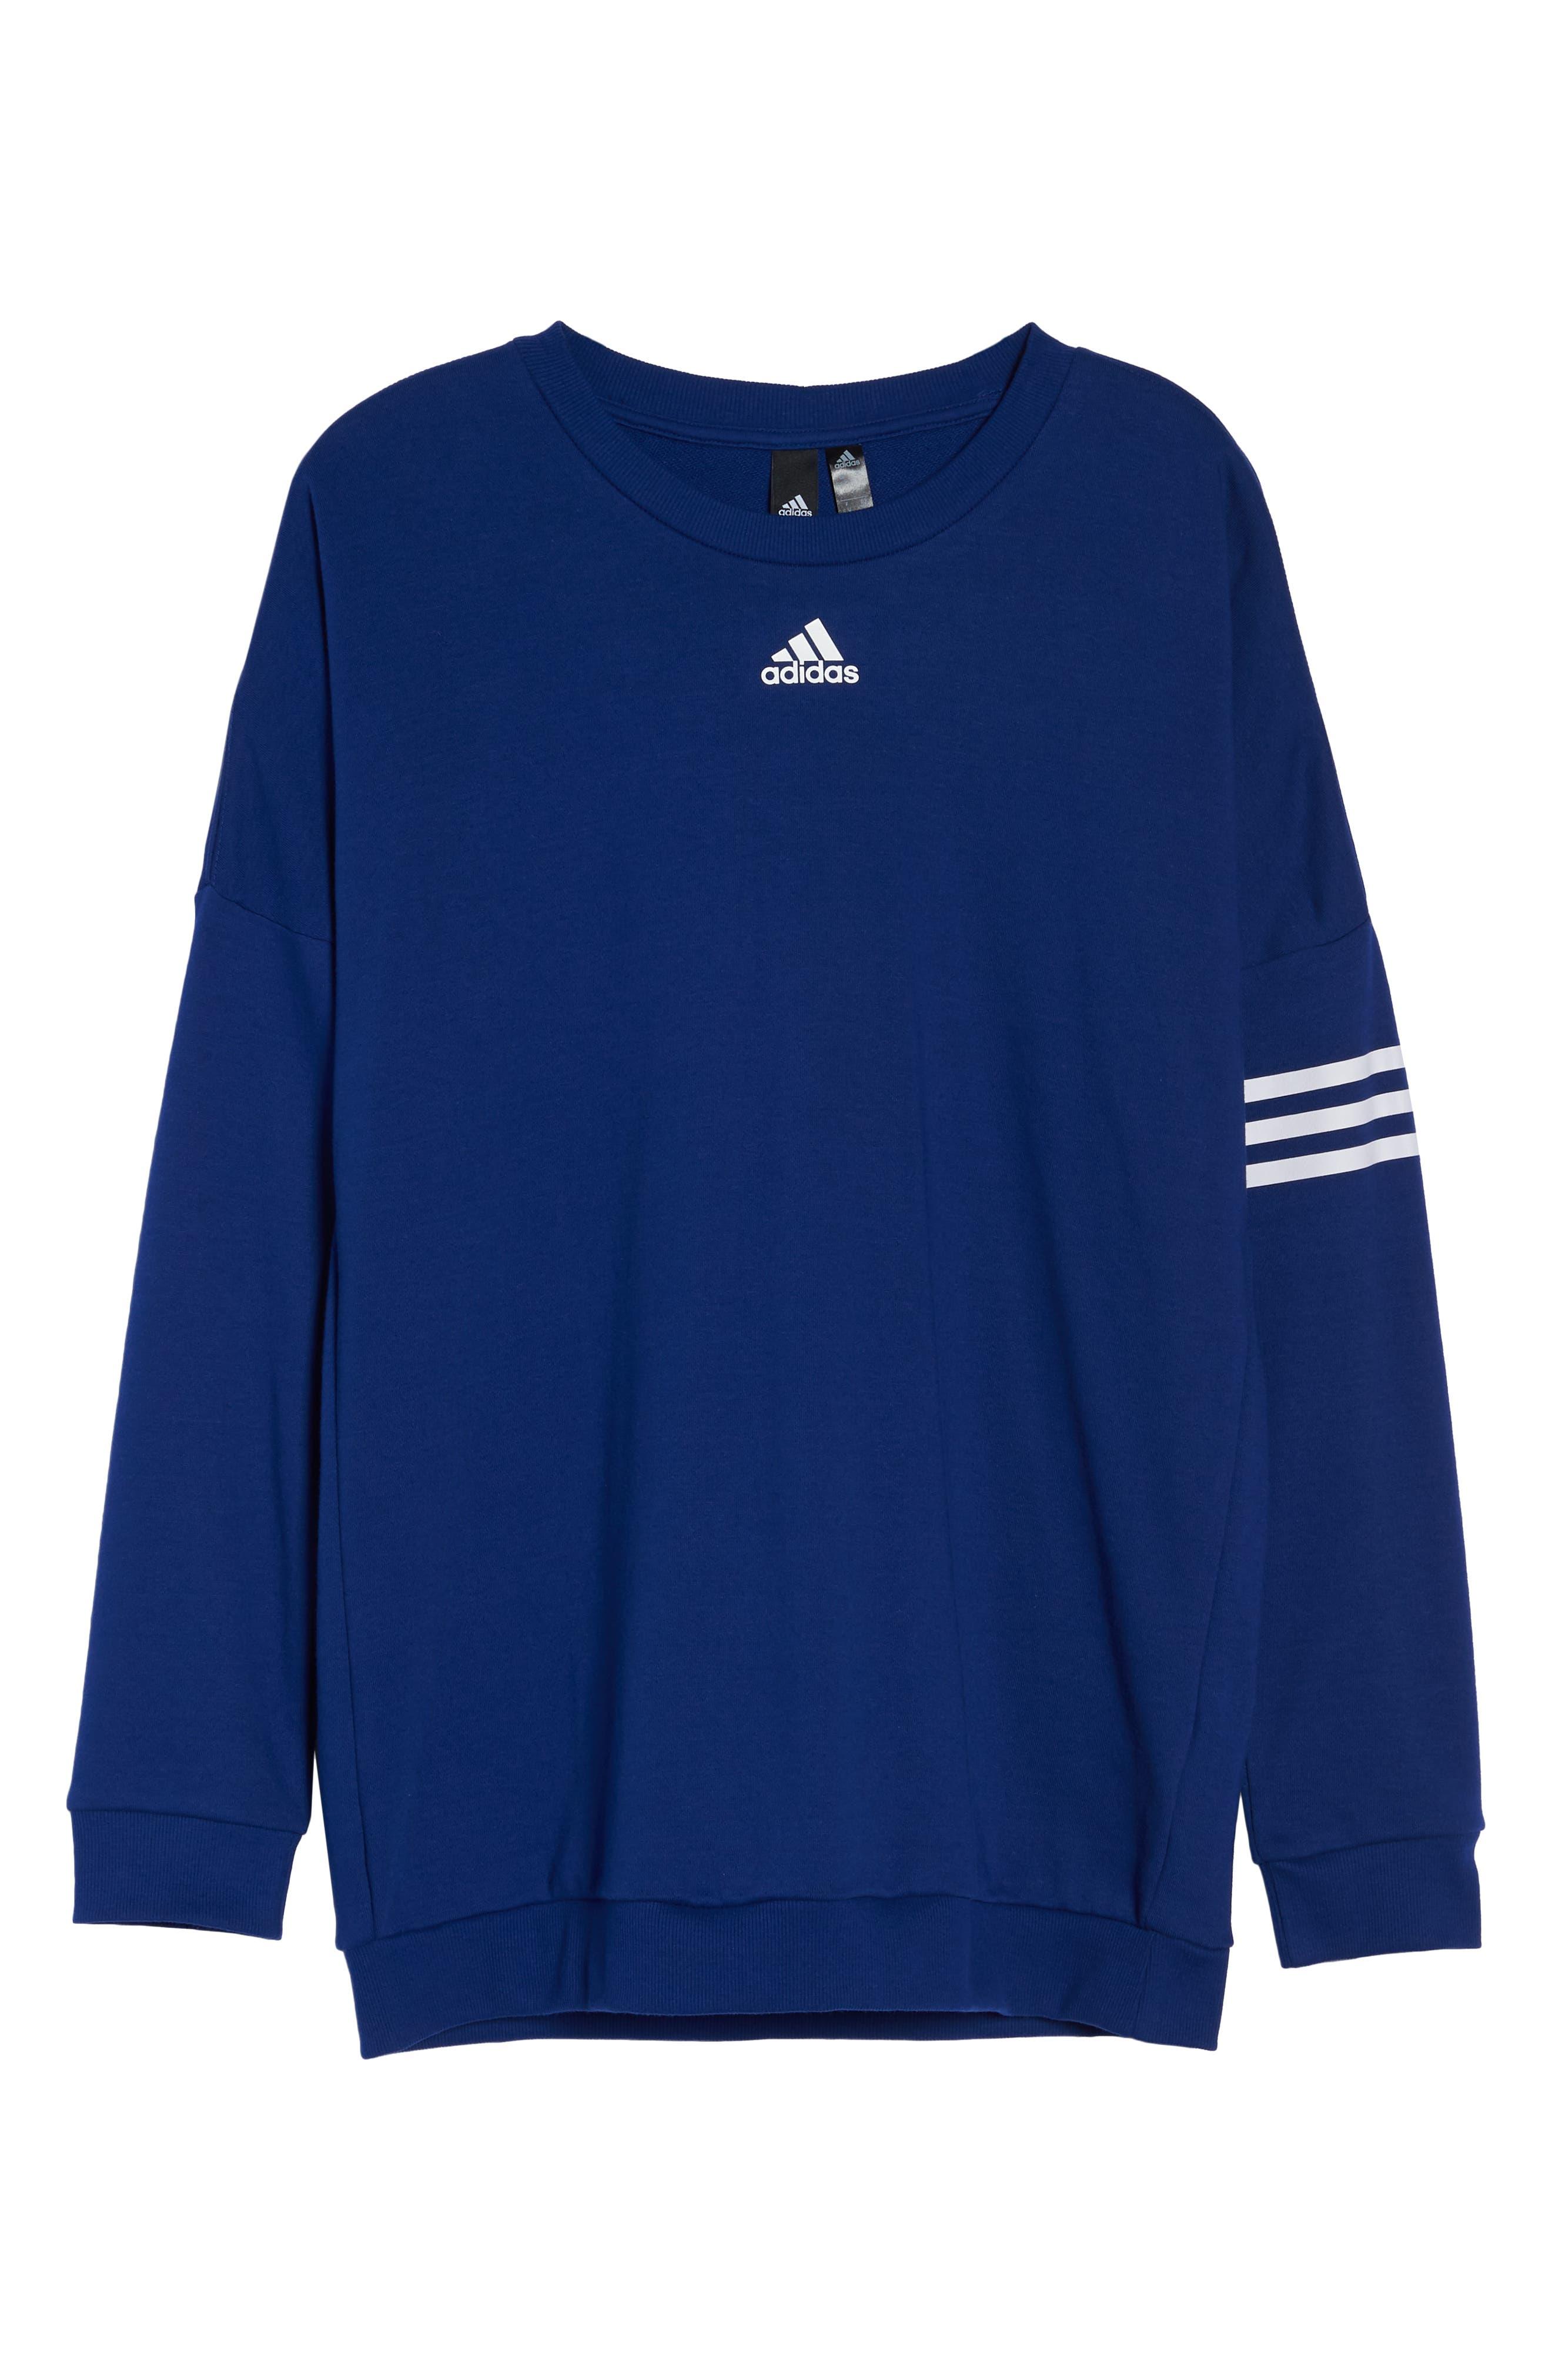 adidas Oversize Crewneck Sweatshirt,                             Alternate thumbnail 7, color,                             MYSTERY INK